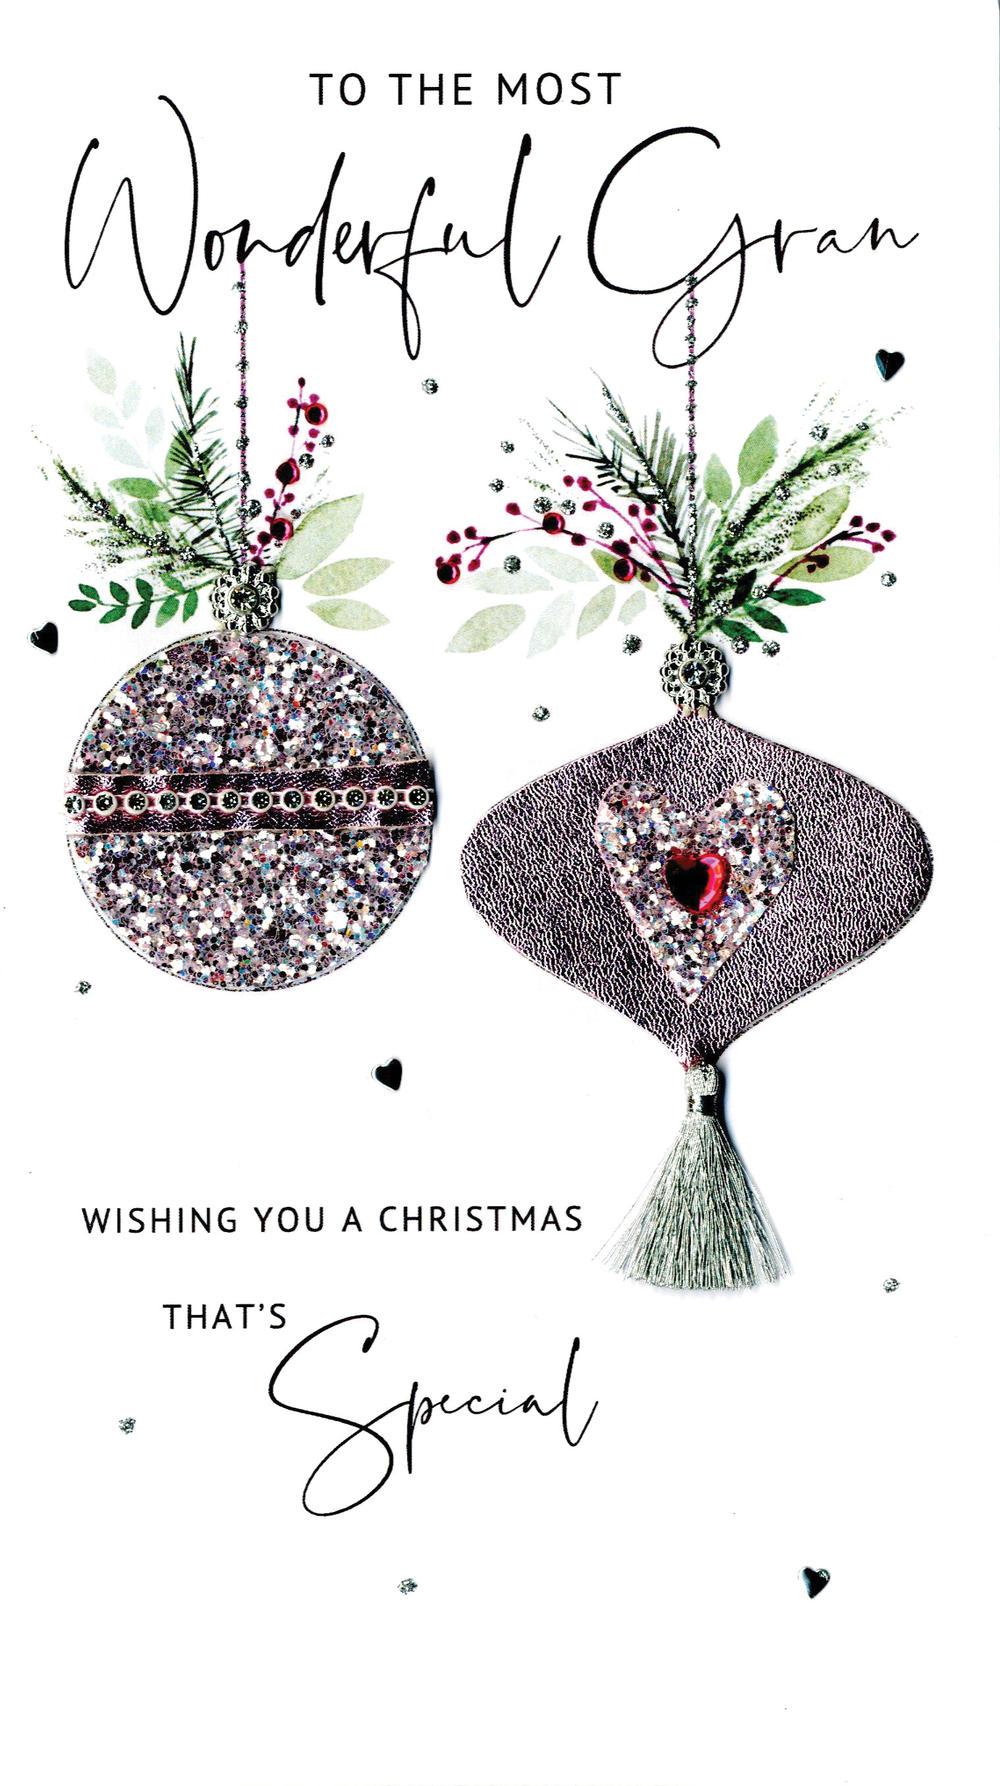 Wonderful Gran Embellished Christmas Card Hand-Finished